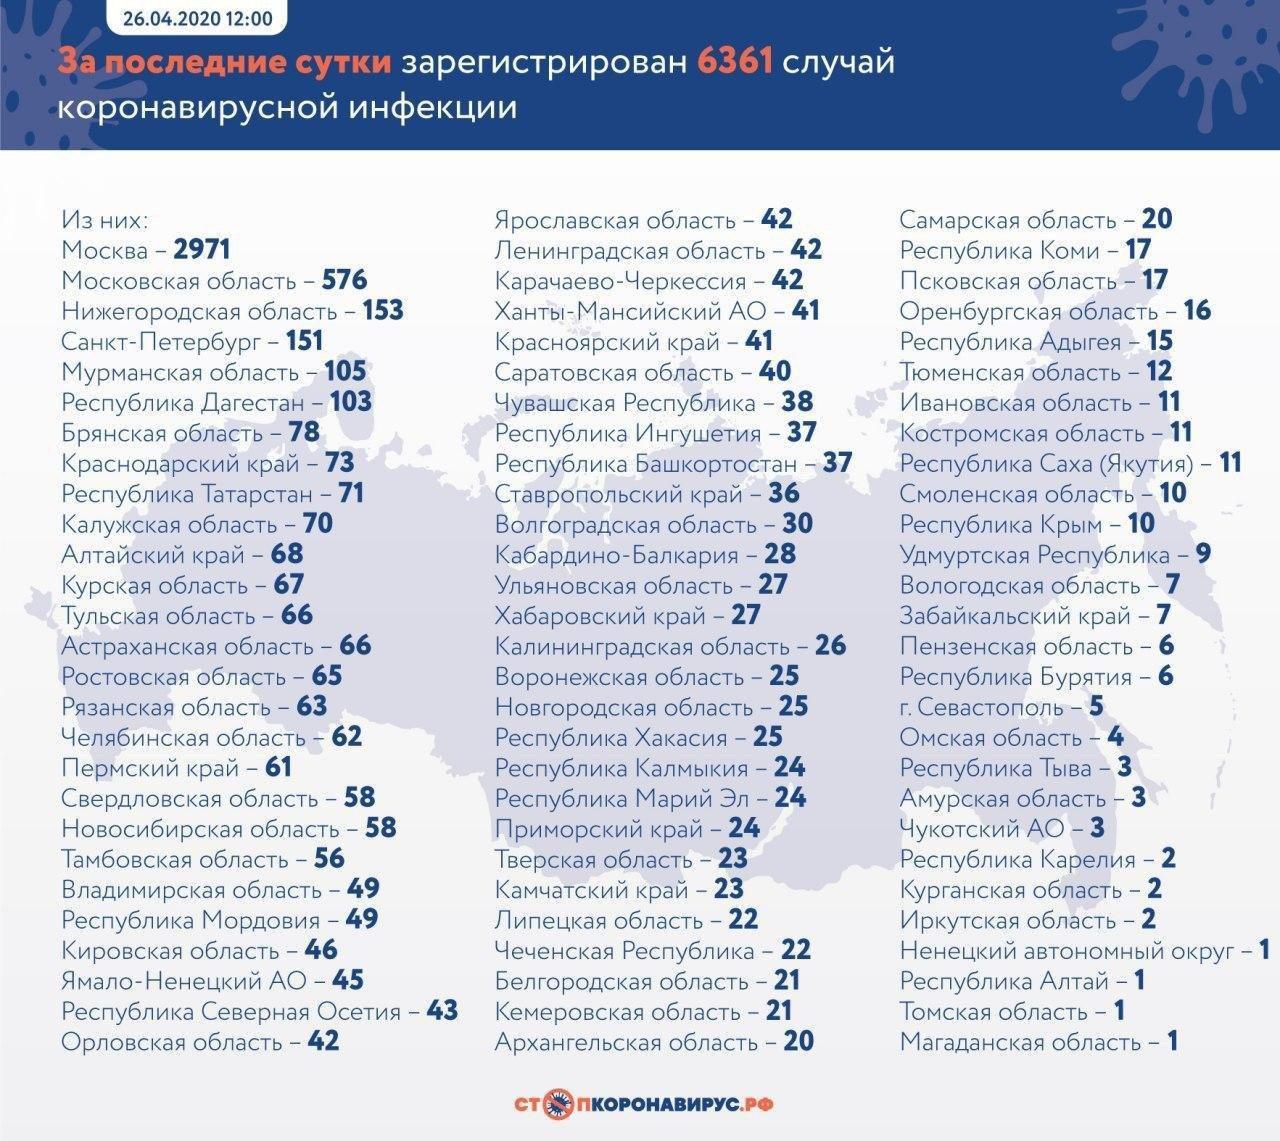 Статистика по коронавирусу в России на 26 апреля